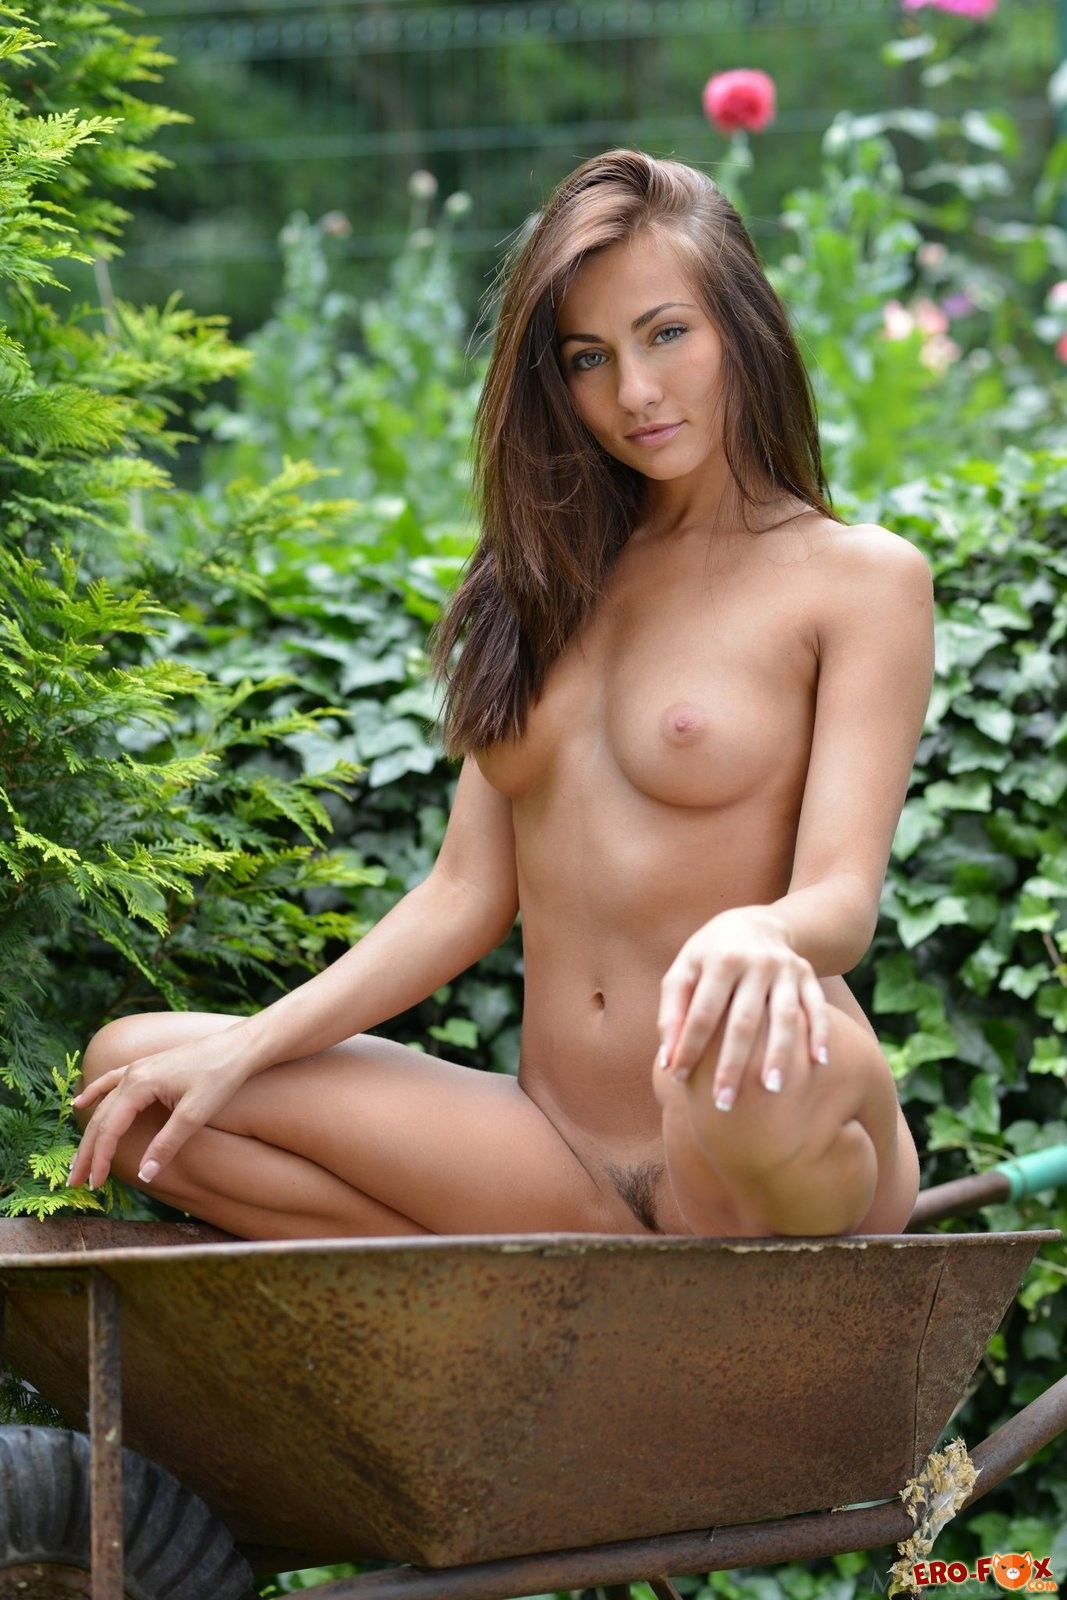 Голая девушка на садовом участке